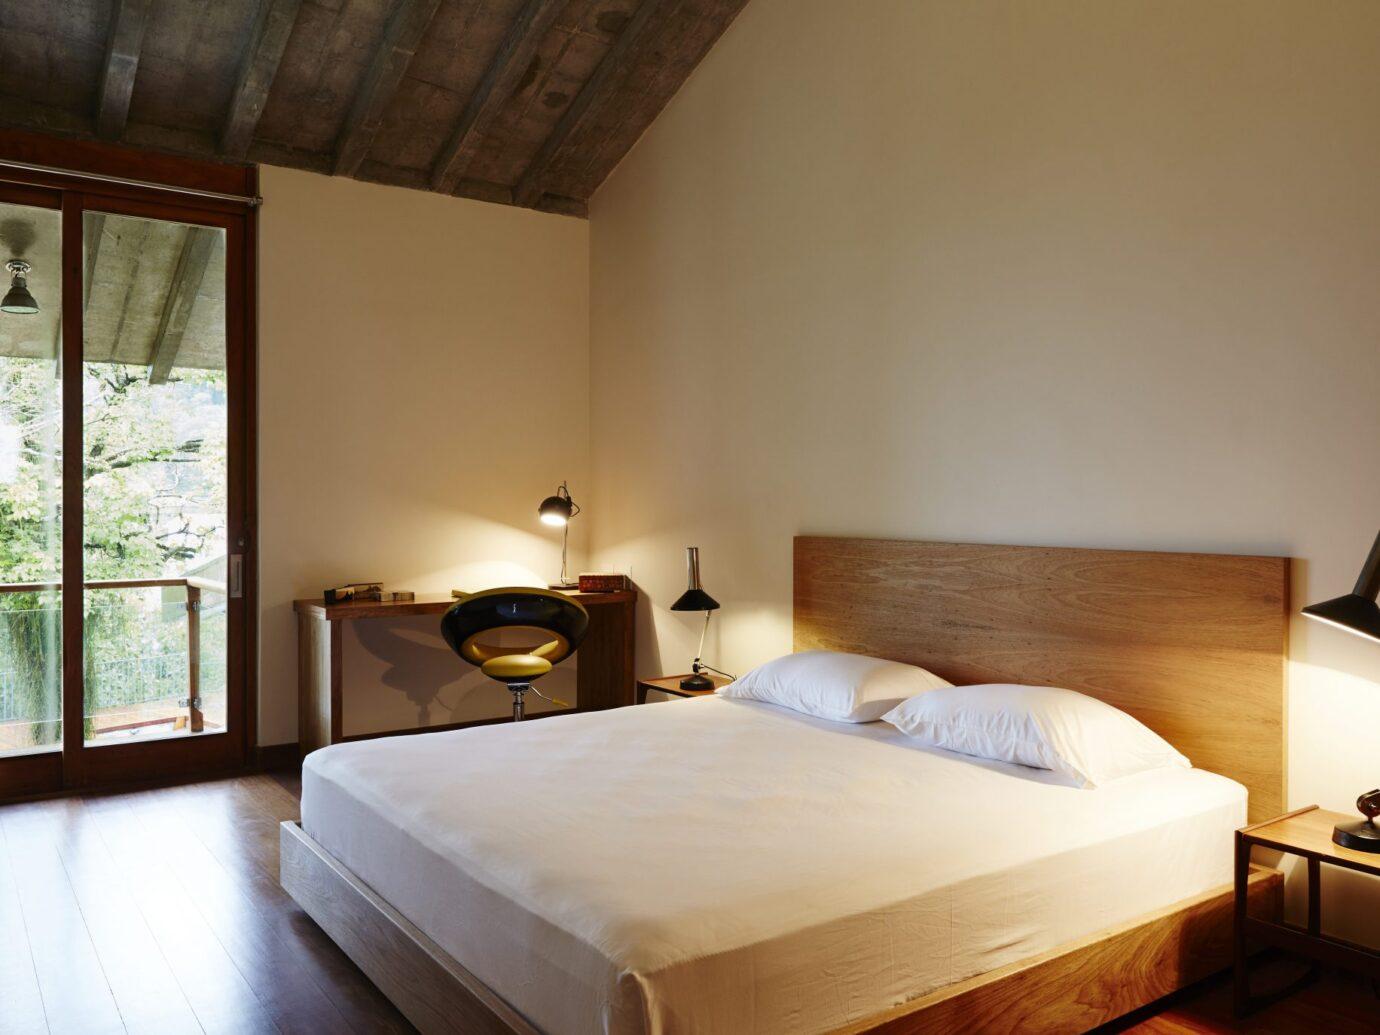 Suite bedroom at Chez Georges Rio de Janeiro